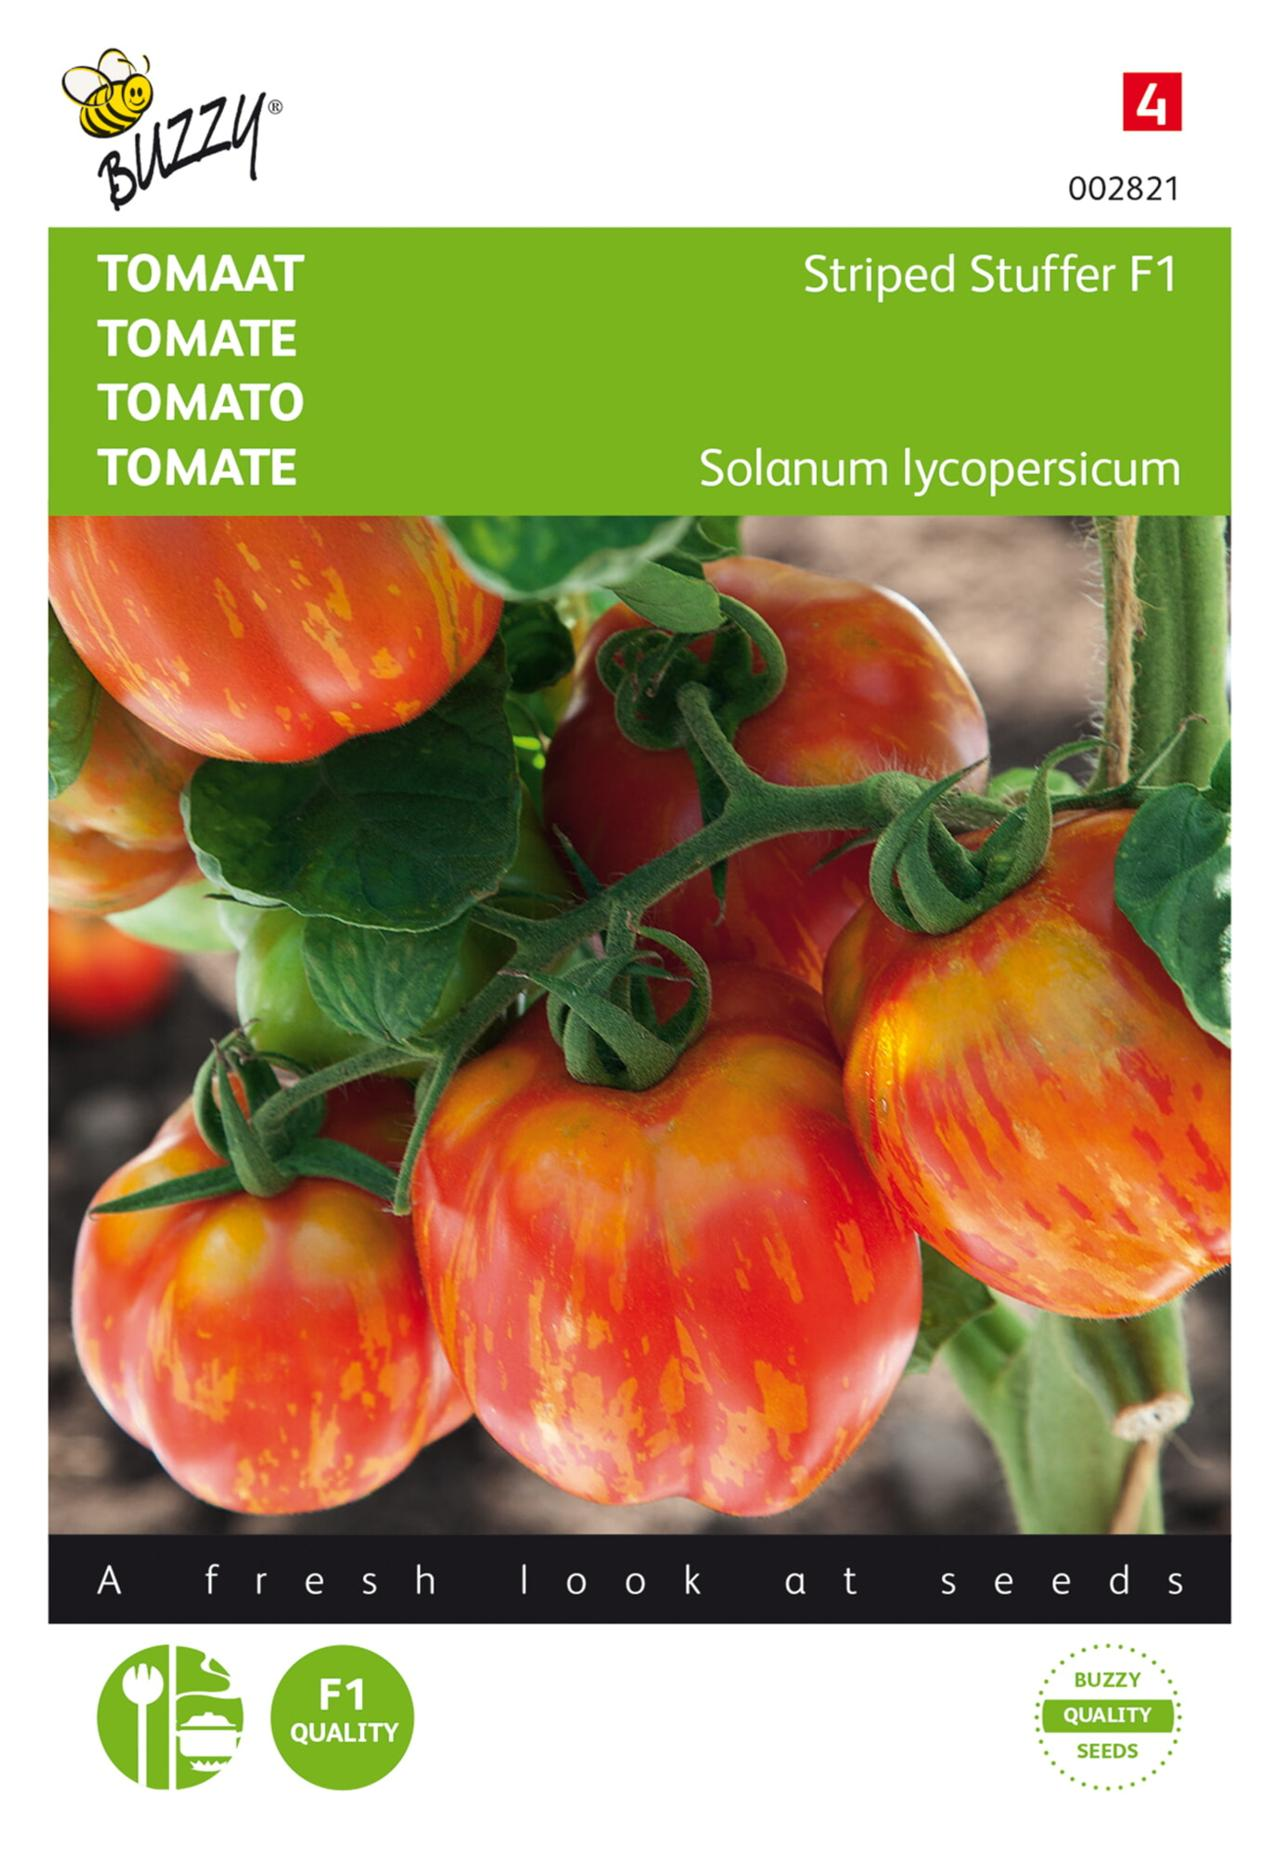 Solanum lycopersicum 'Striped Stuffer F1' plant